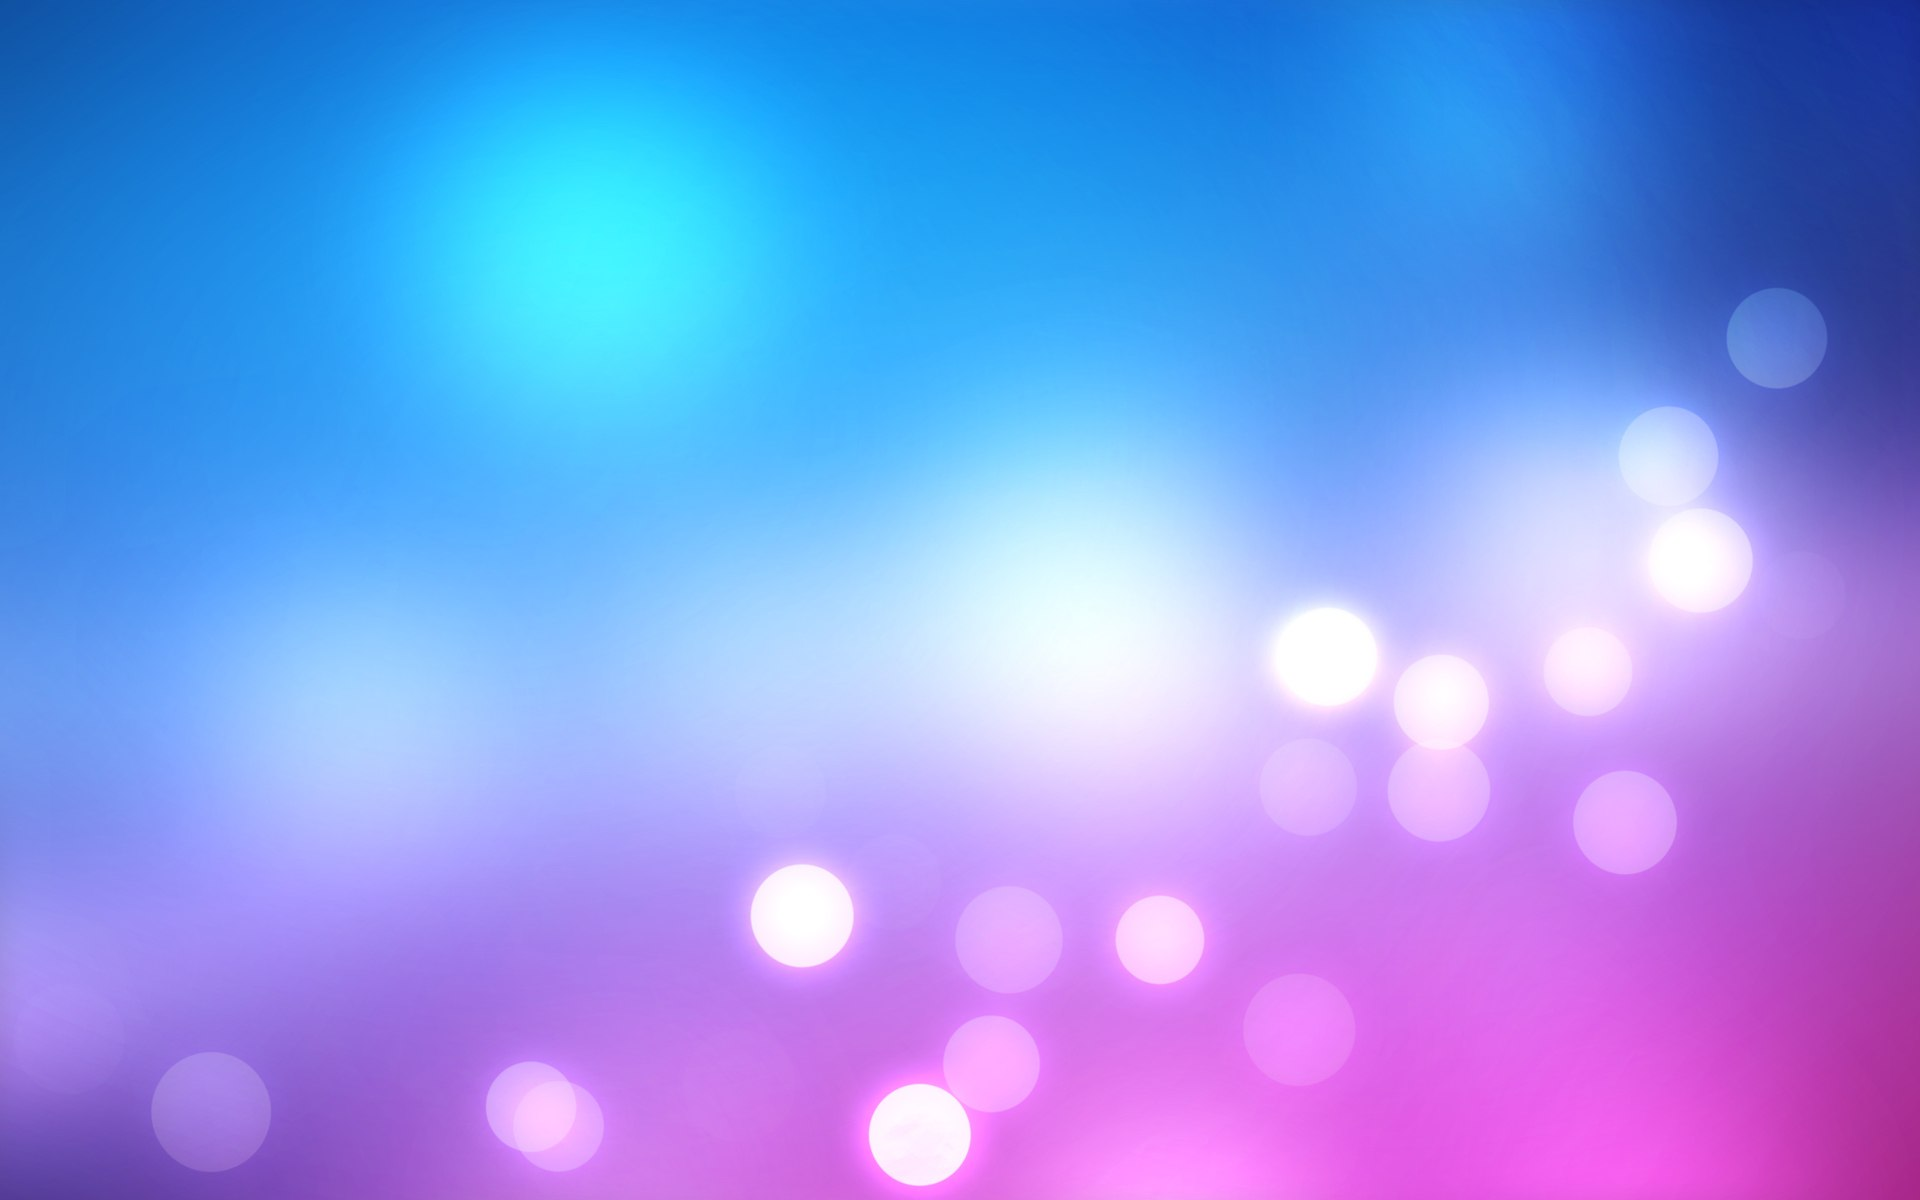 Bokeh lights wallpaper 1920x1200 HQ WALLPAPER - (#44051)